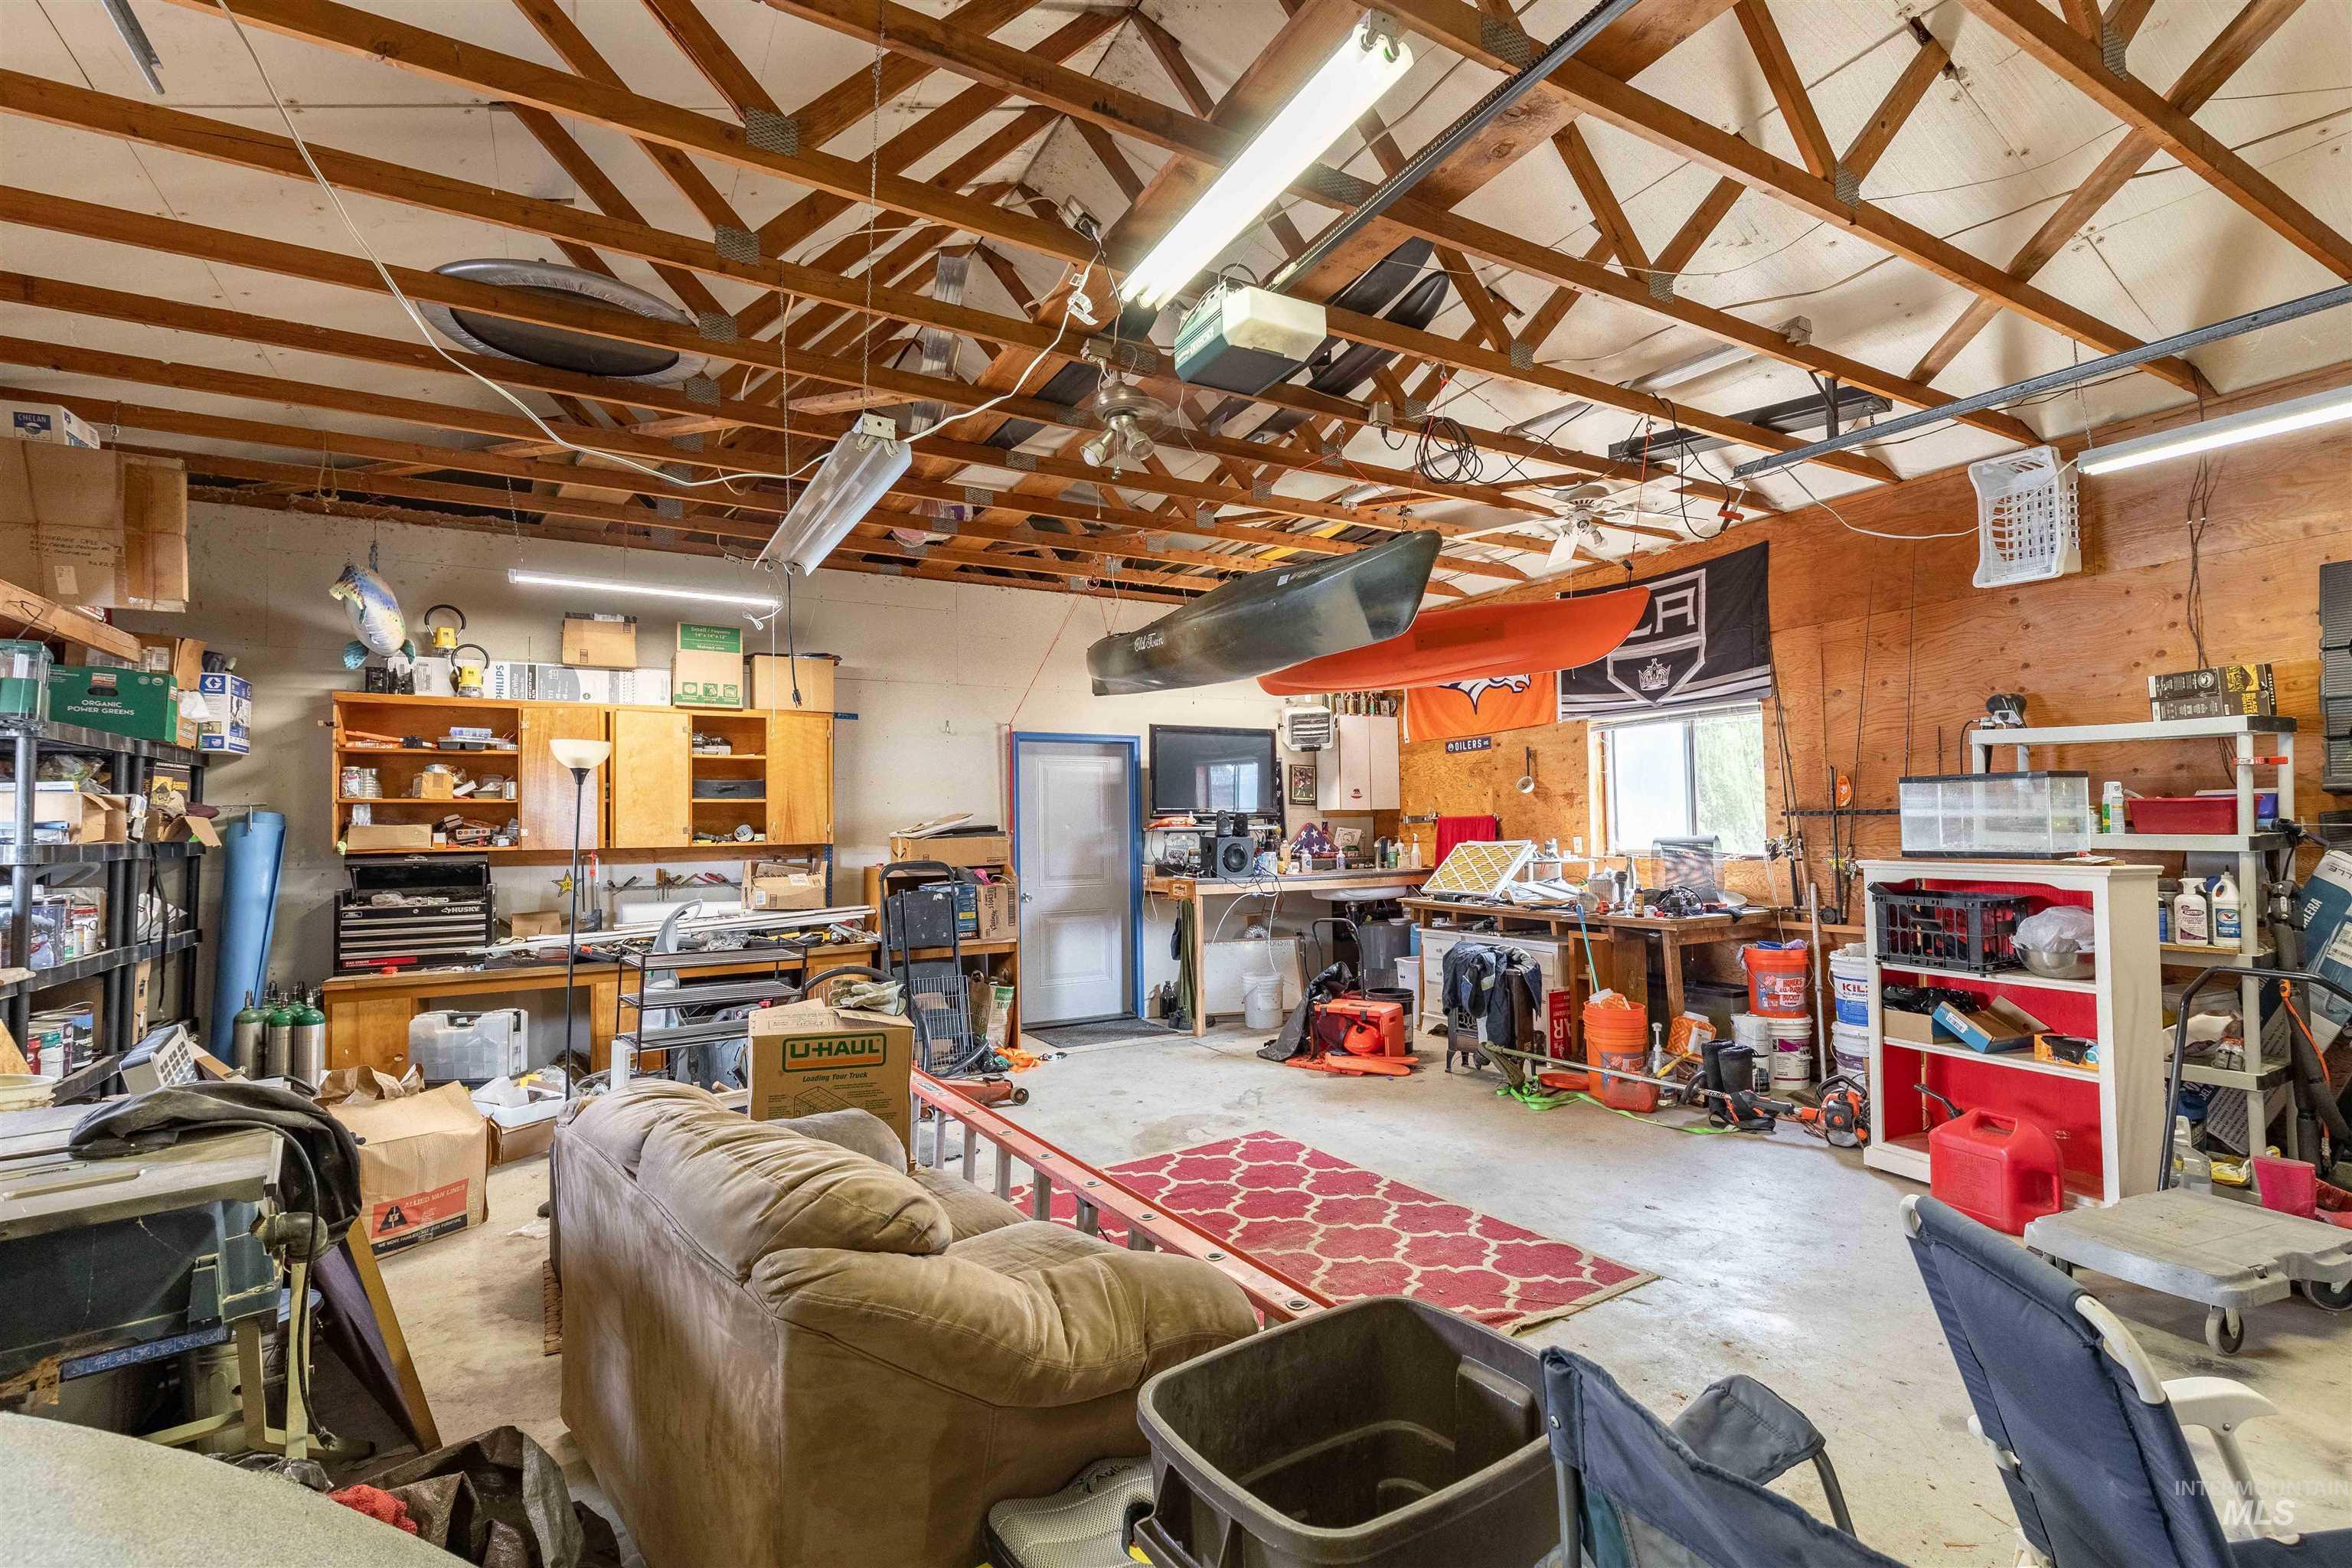 346 N Jackson Property Photo 29